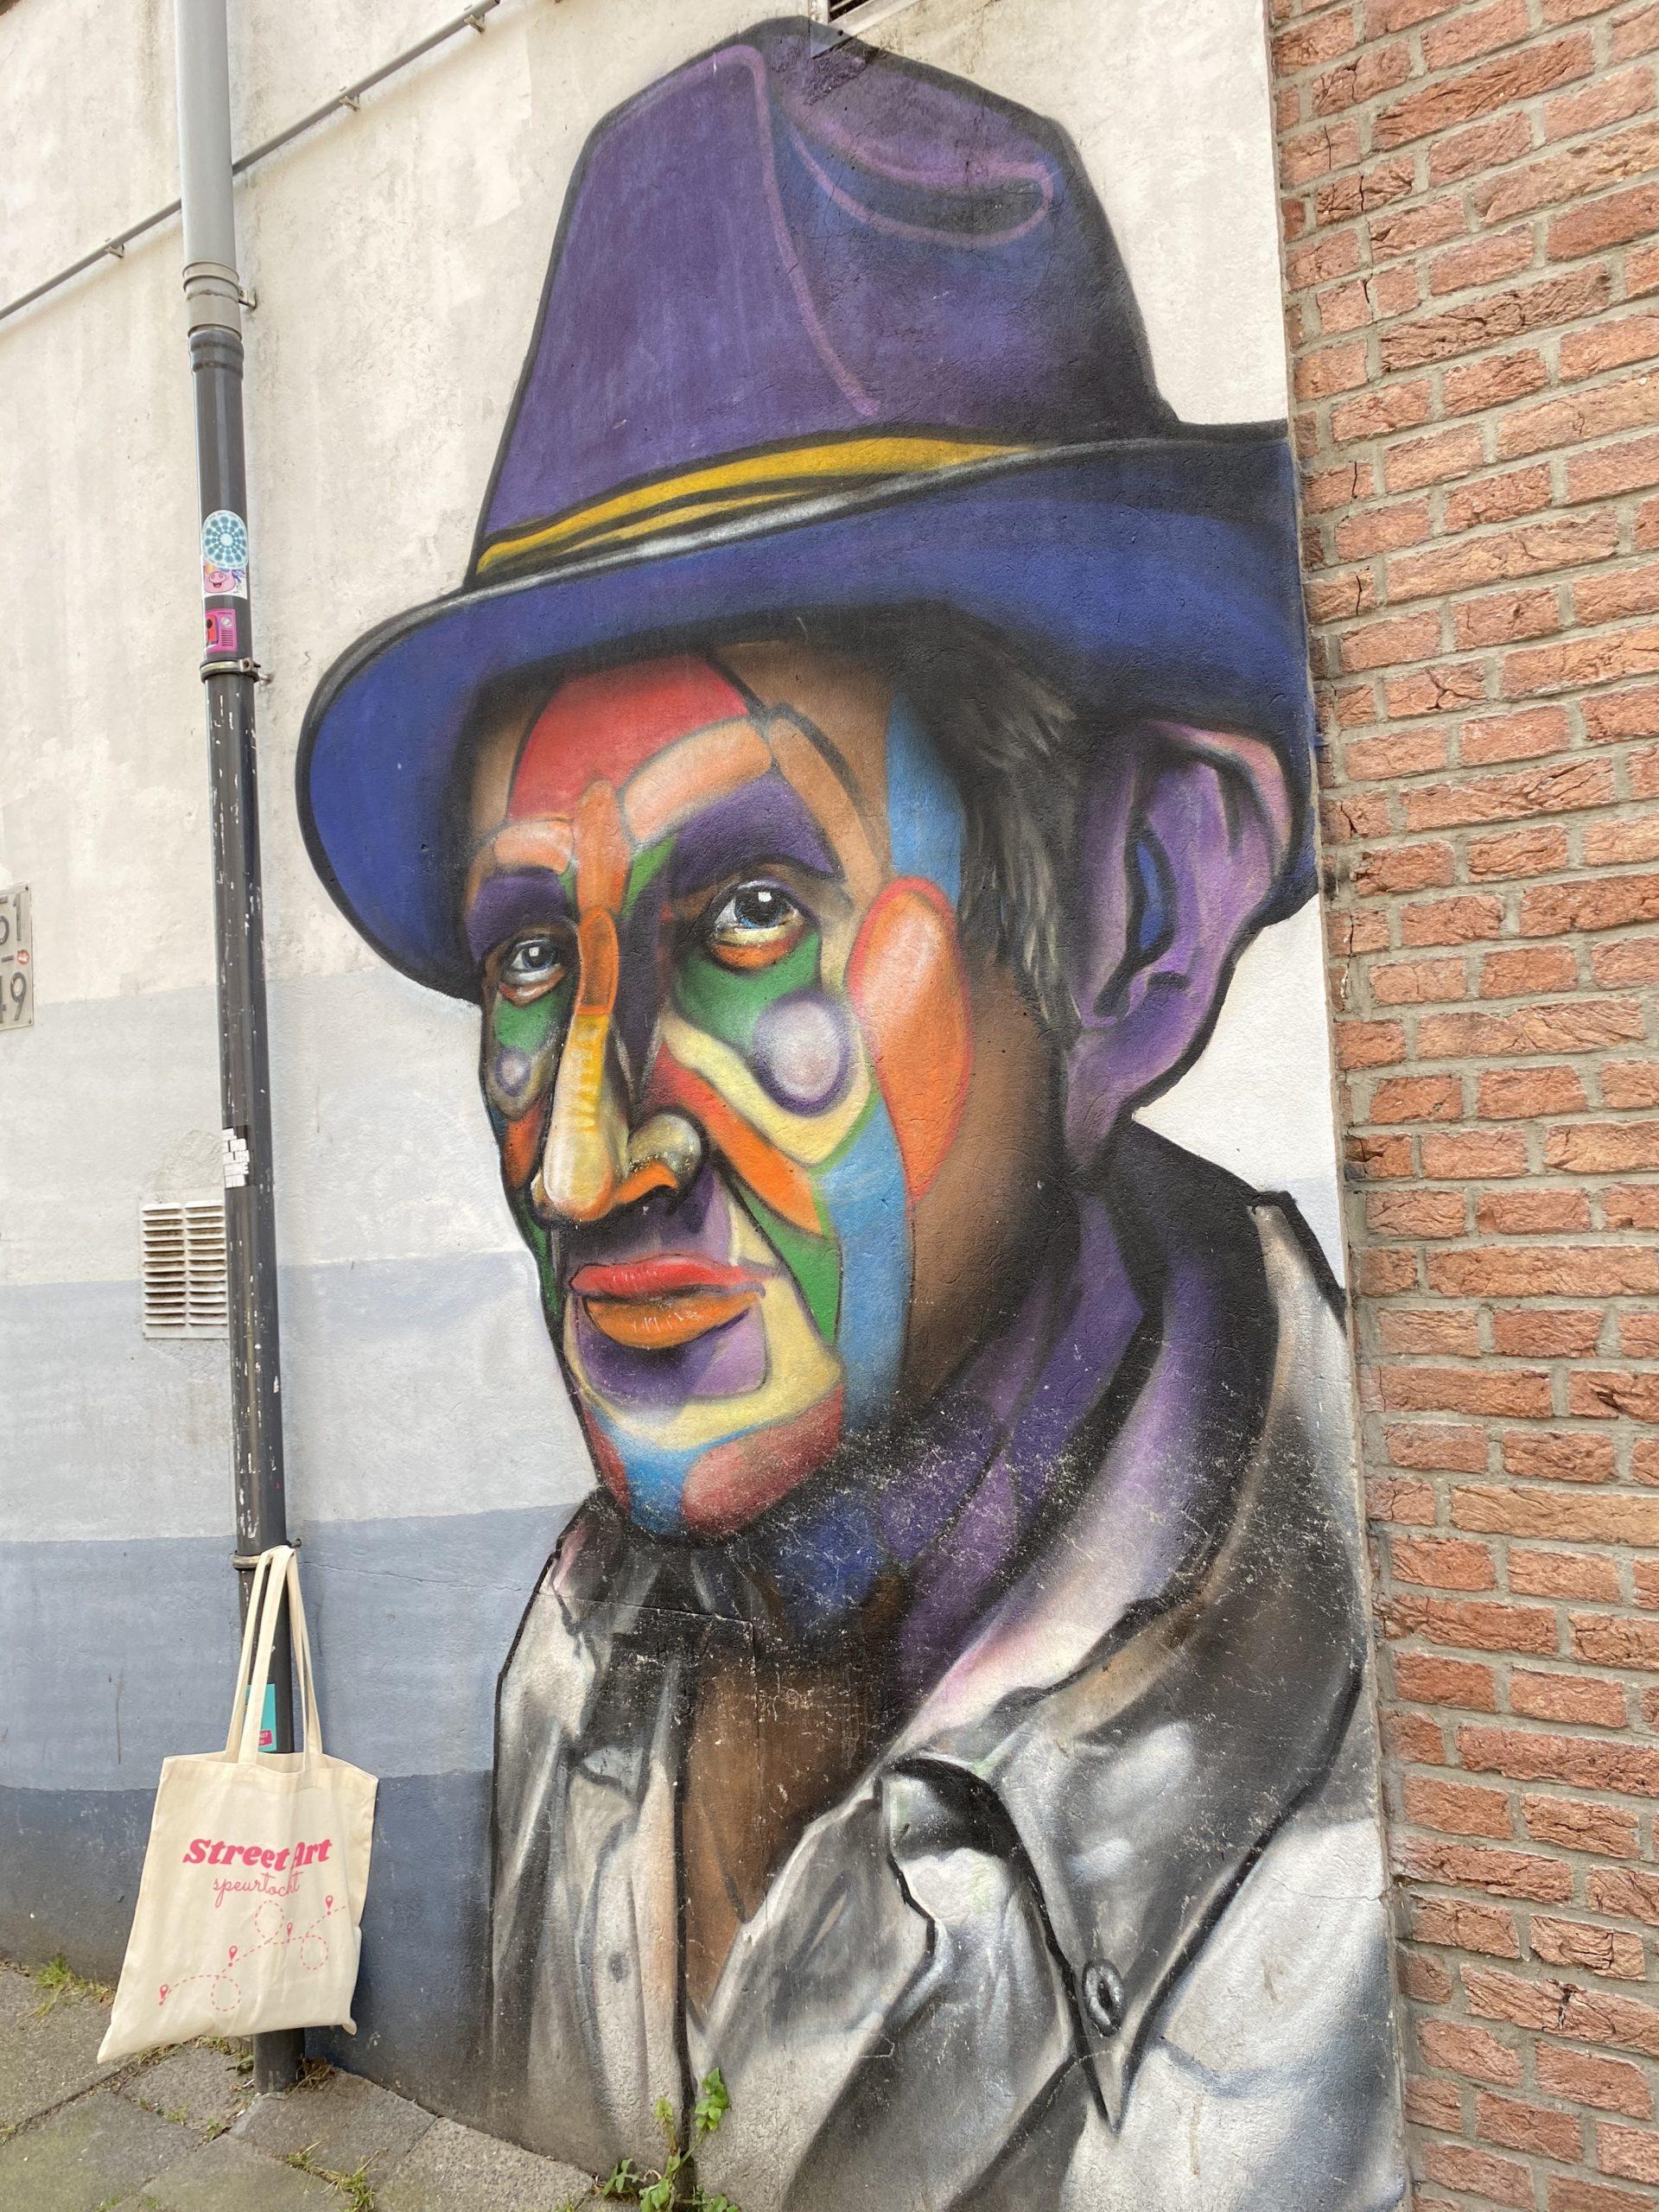 street art speurtocht rotterdam - street art wandeling rotterdam - interactieve speurtocht rotterdam - make it happen rotterdam - kunstwandeling rotterdam - coronaproof uitjes rotterdam